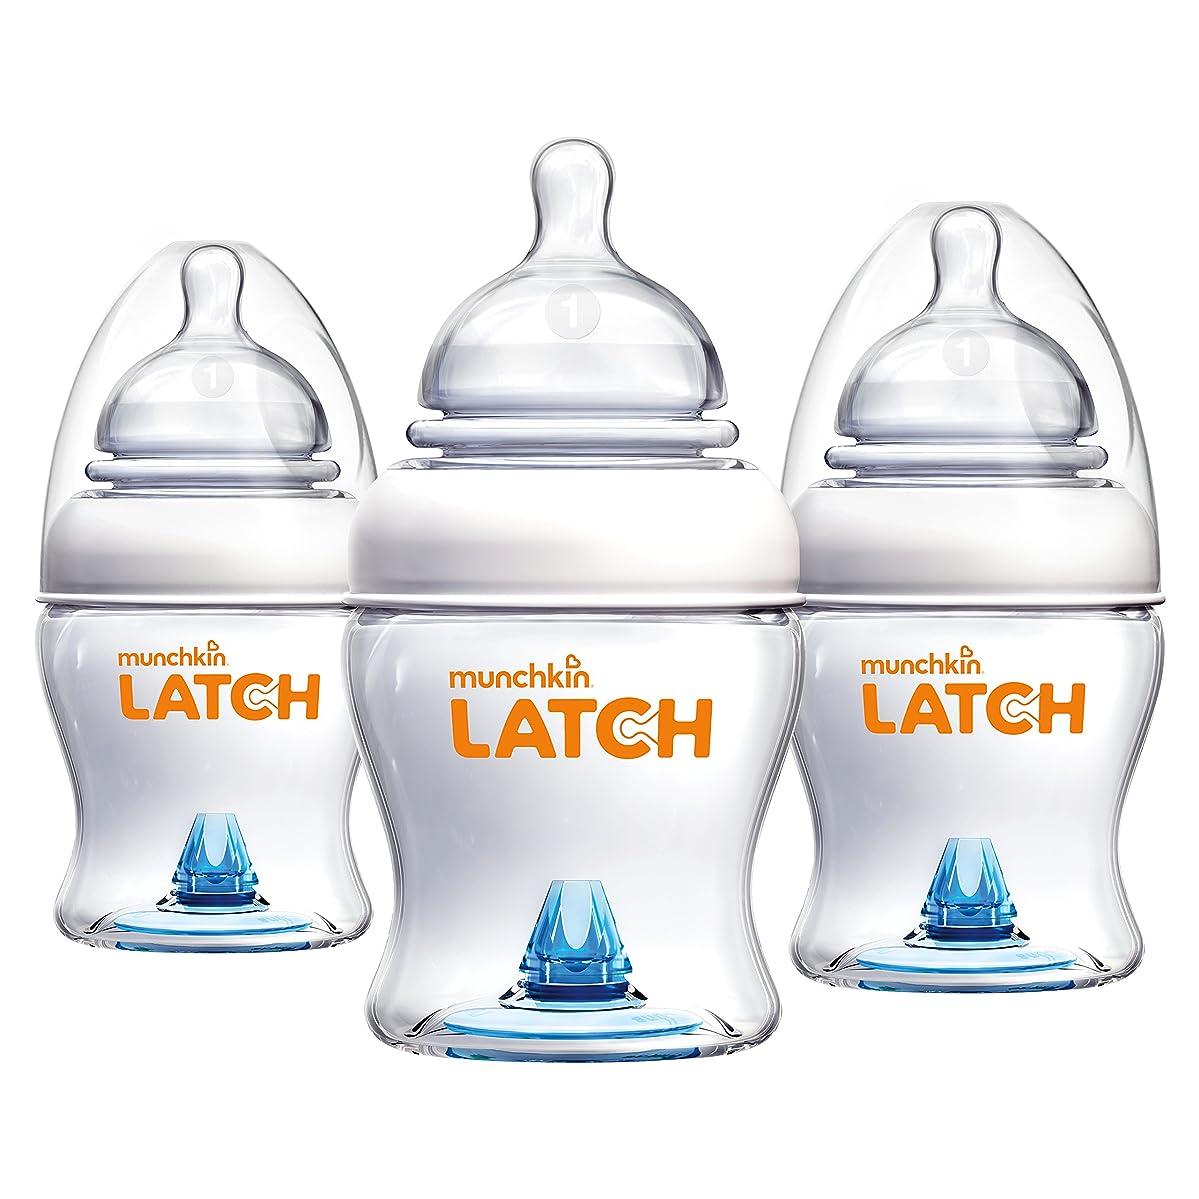 Munchkin Latch Anti-Colic Baby Bottle with Ultra Flexible Breast-like Nipple, BPA Free, 4 Ounce, 3 Pack